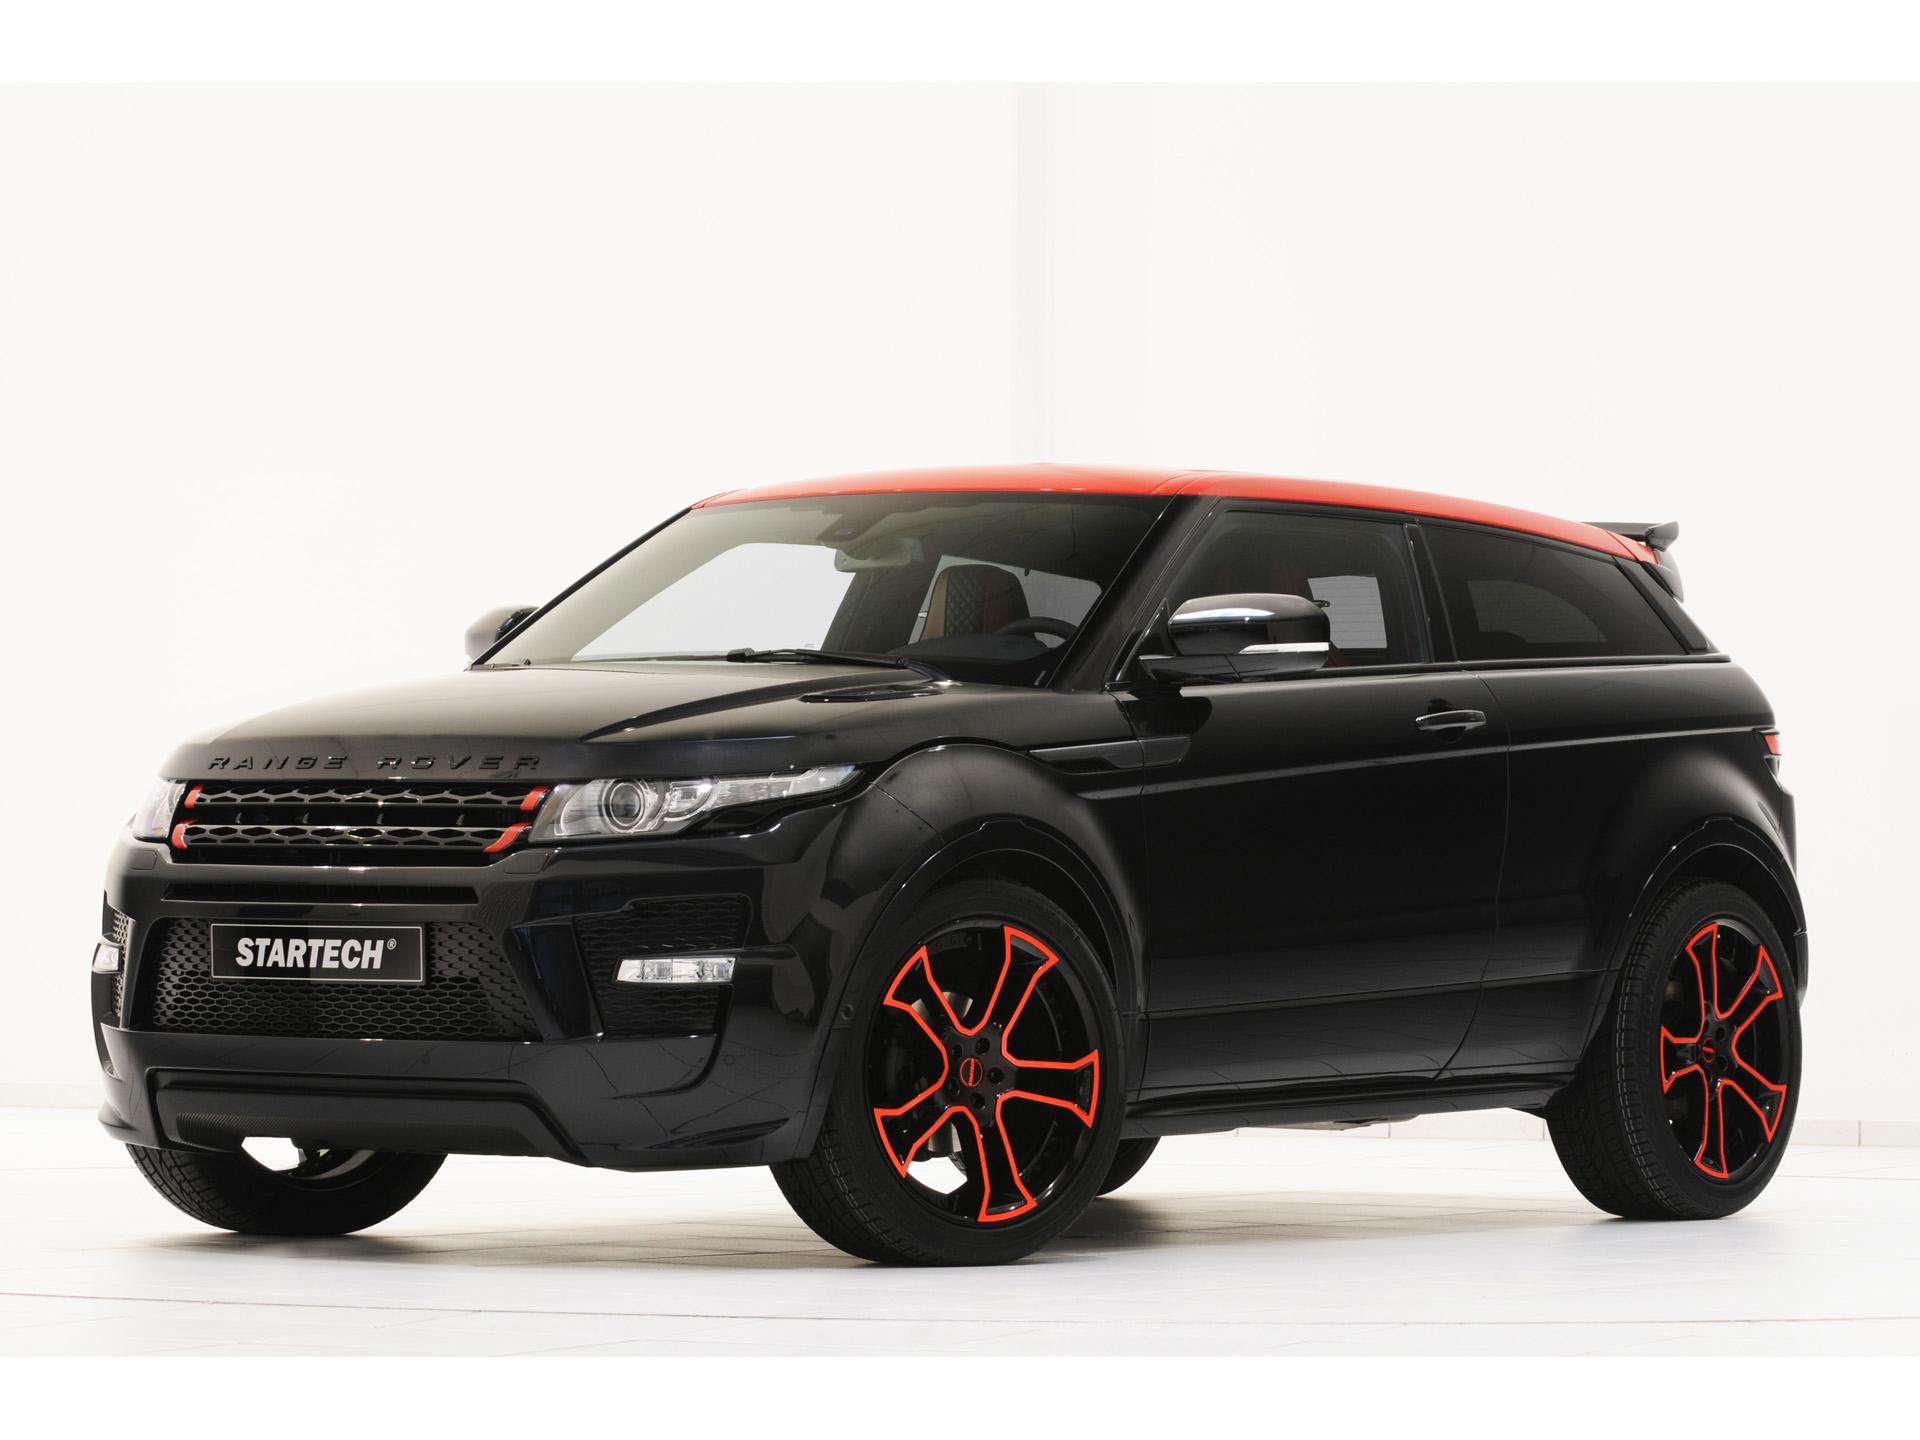 https://www.conceptcarz.com/images/Land%20Rover/2012-Startech-Range-Rover-Evoque-01.jpg